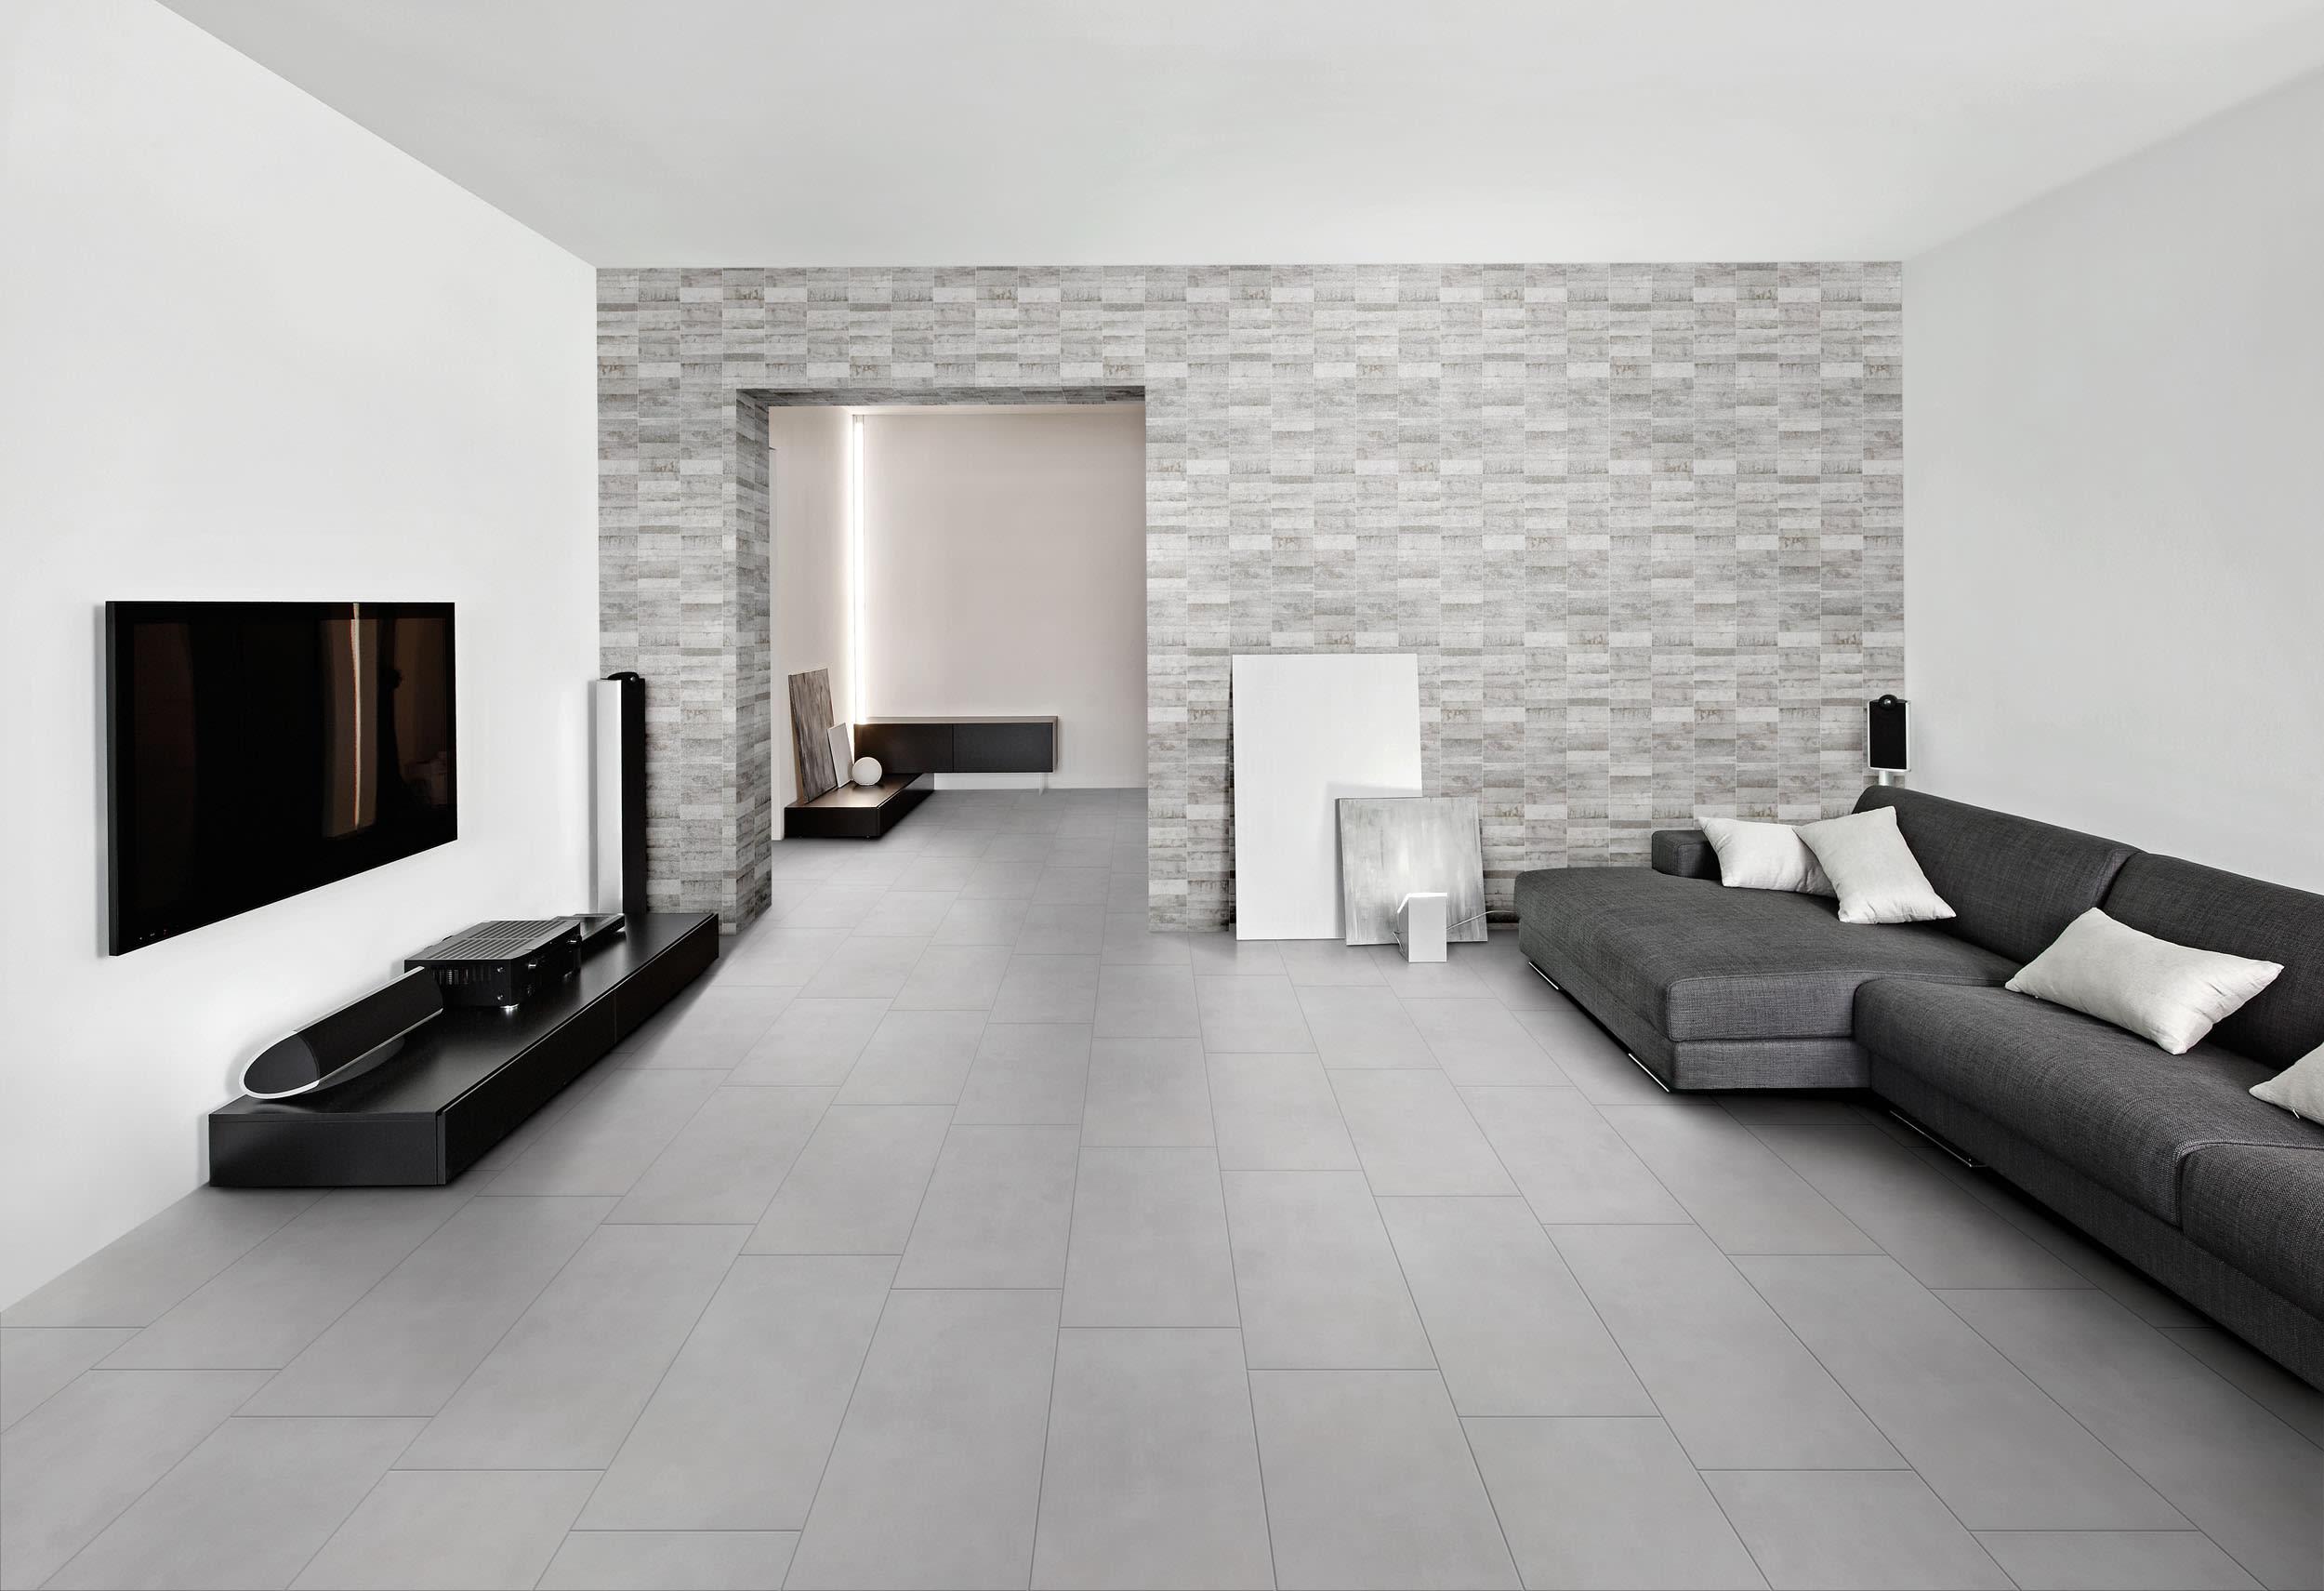 Colla per pavimenti kerakoll prezzi fugalite eco kg kerakoll